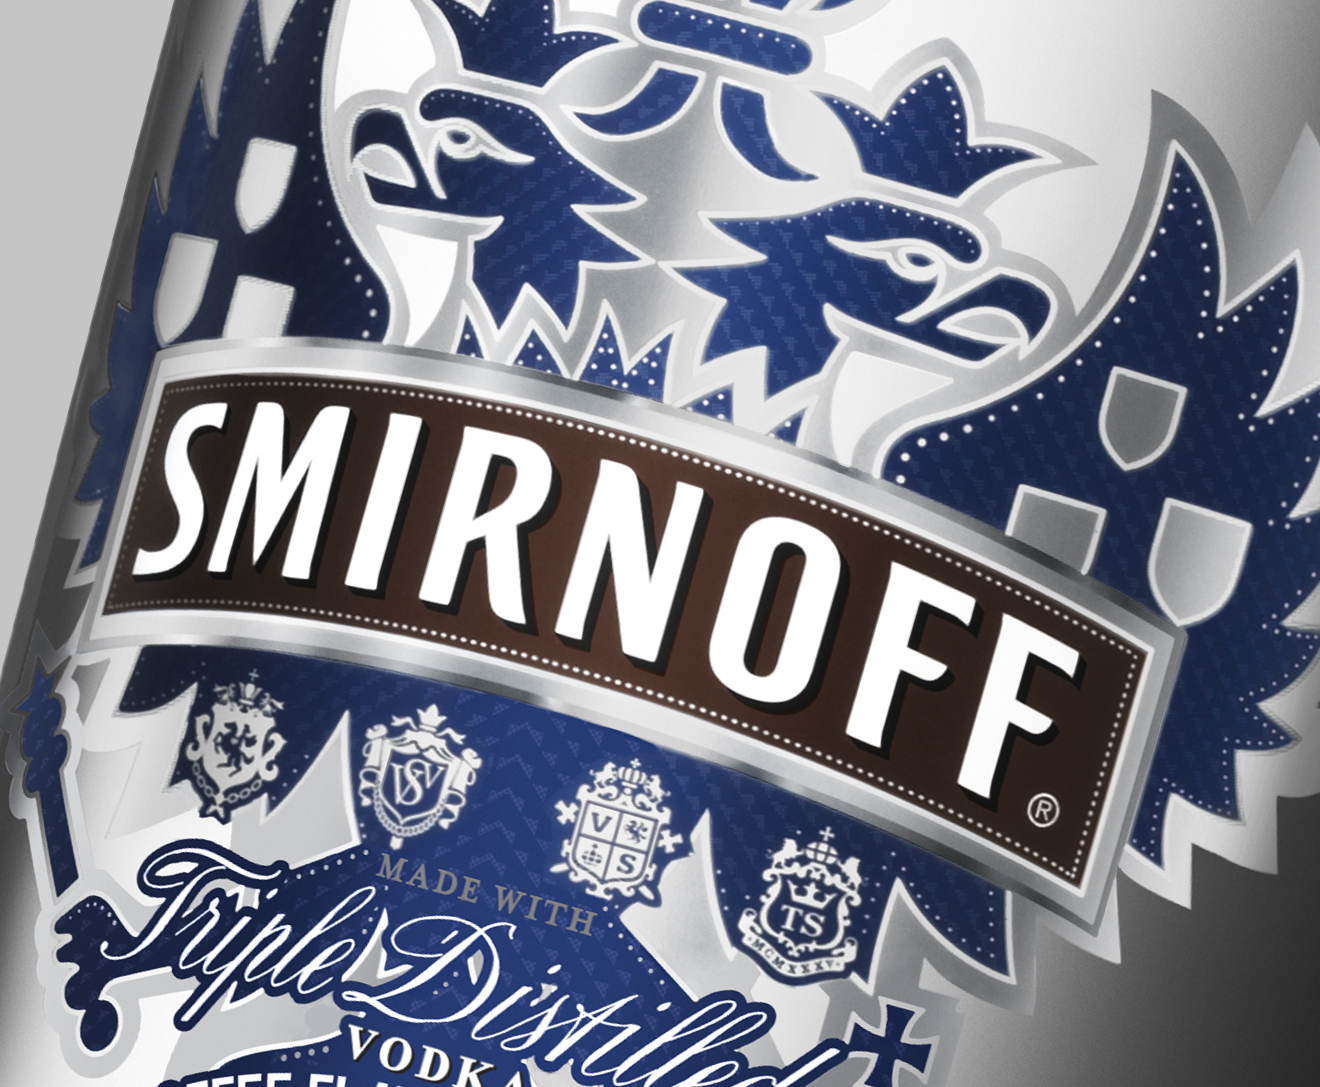 Smirnoff vodka rootbeer flavor label design closeup